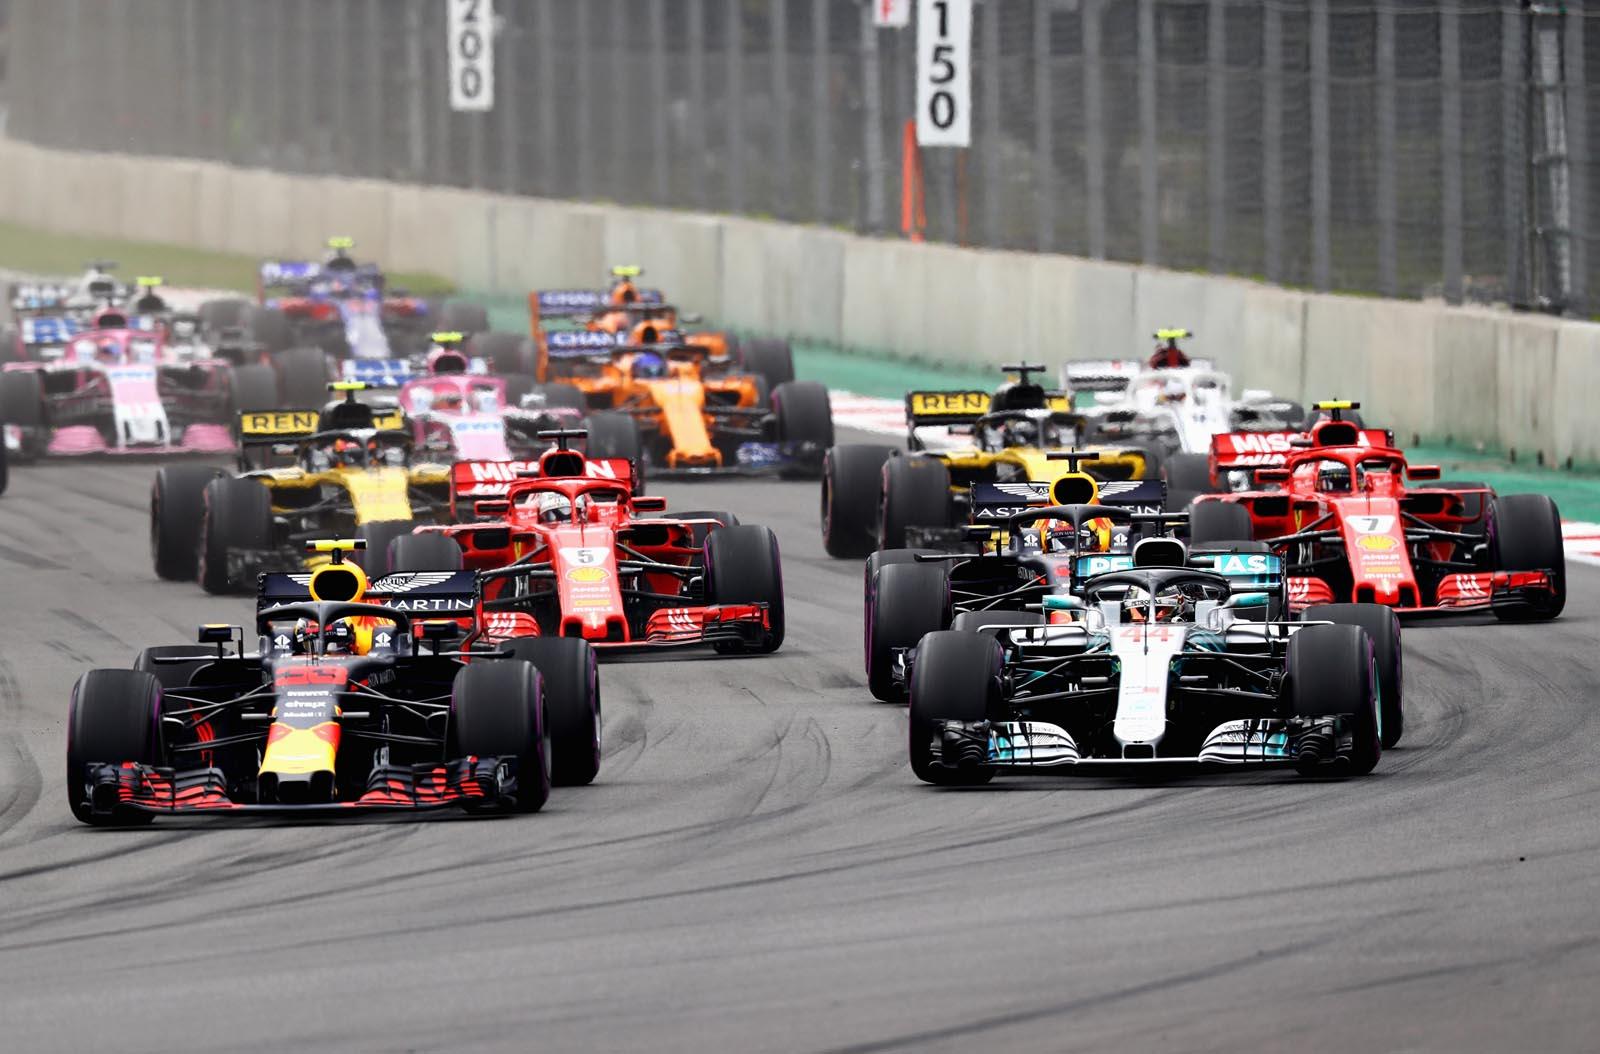 Photo of FIA: H αρχική σύνθεση των ομάδων στην Formula 1 2019